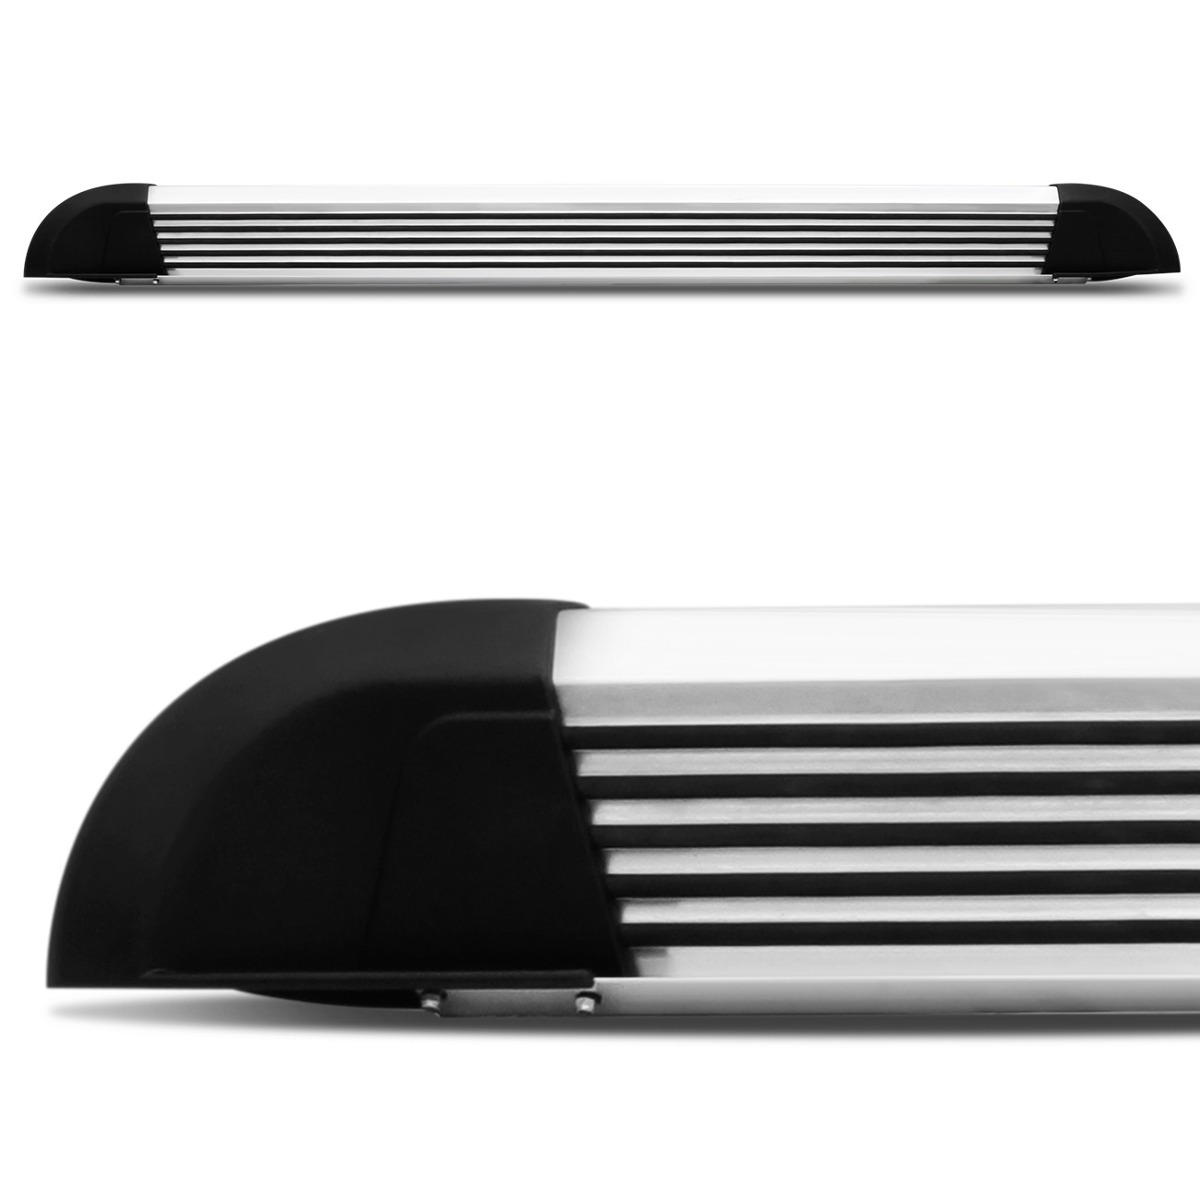 Estribo de alumínio g2 - bepo - s10 cabine dupla 2012 ...  - TERRA DE ASFALTO ACESSÓRIOS